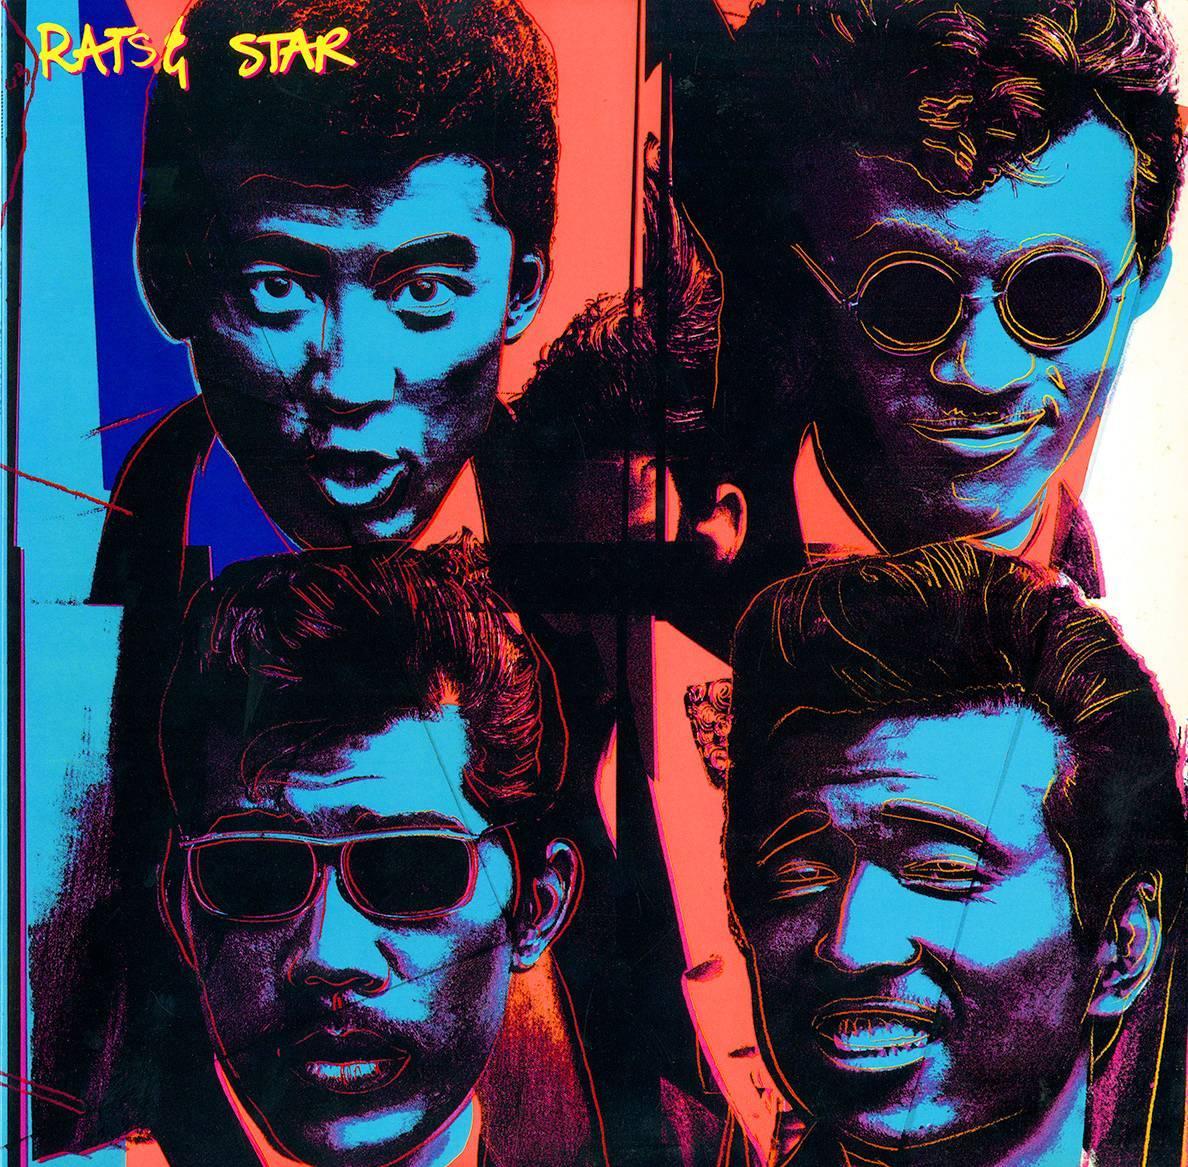 Rare Andy Warhol Record Cover Art (Warhol album art)